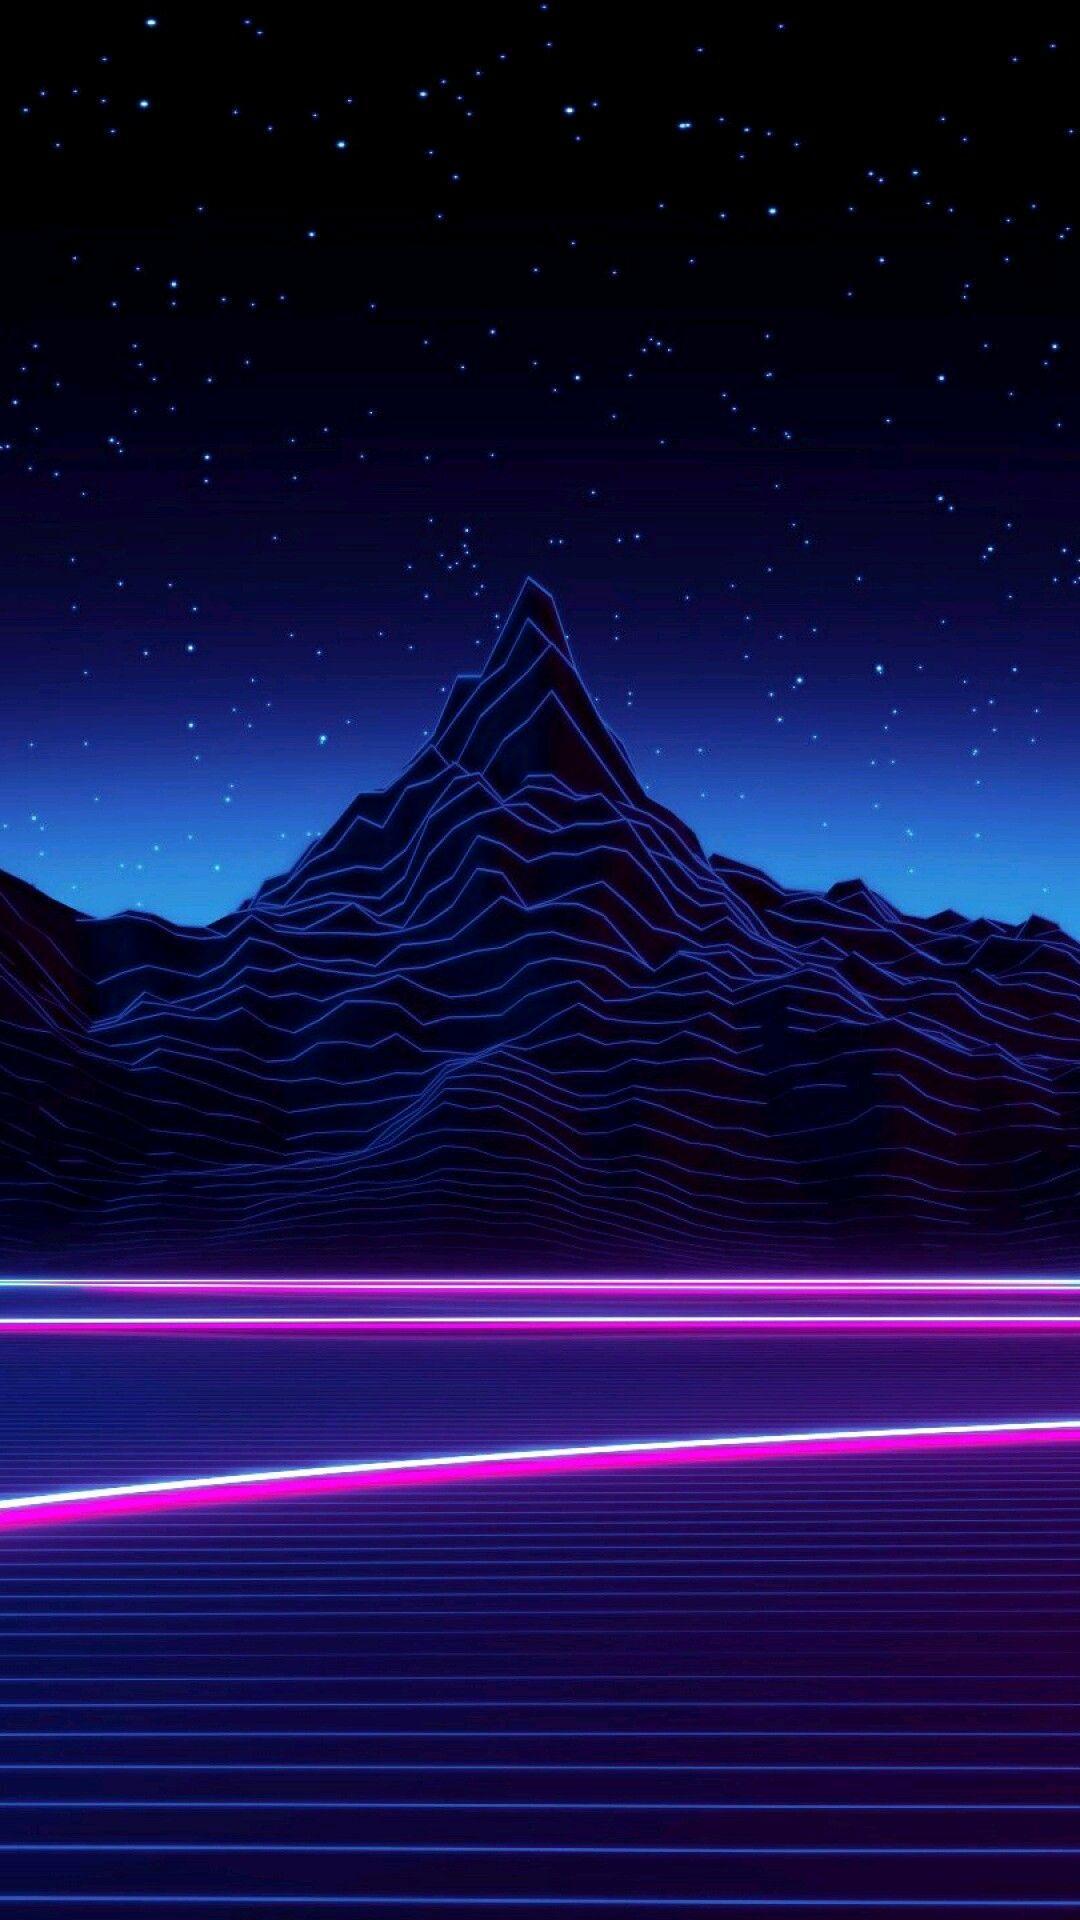 Phone Vaporwave Mountain Wallpapers - Wallpaper Cave